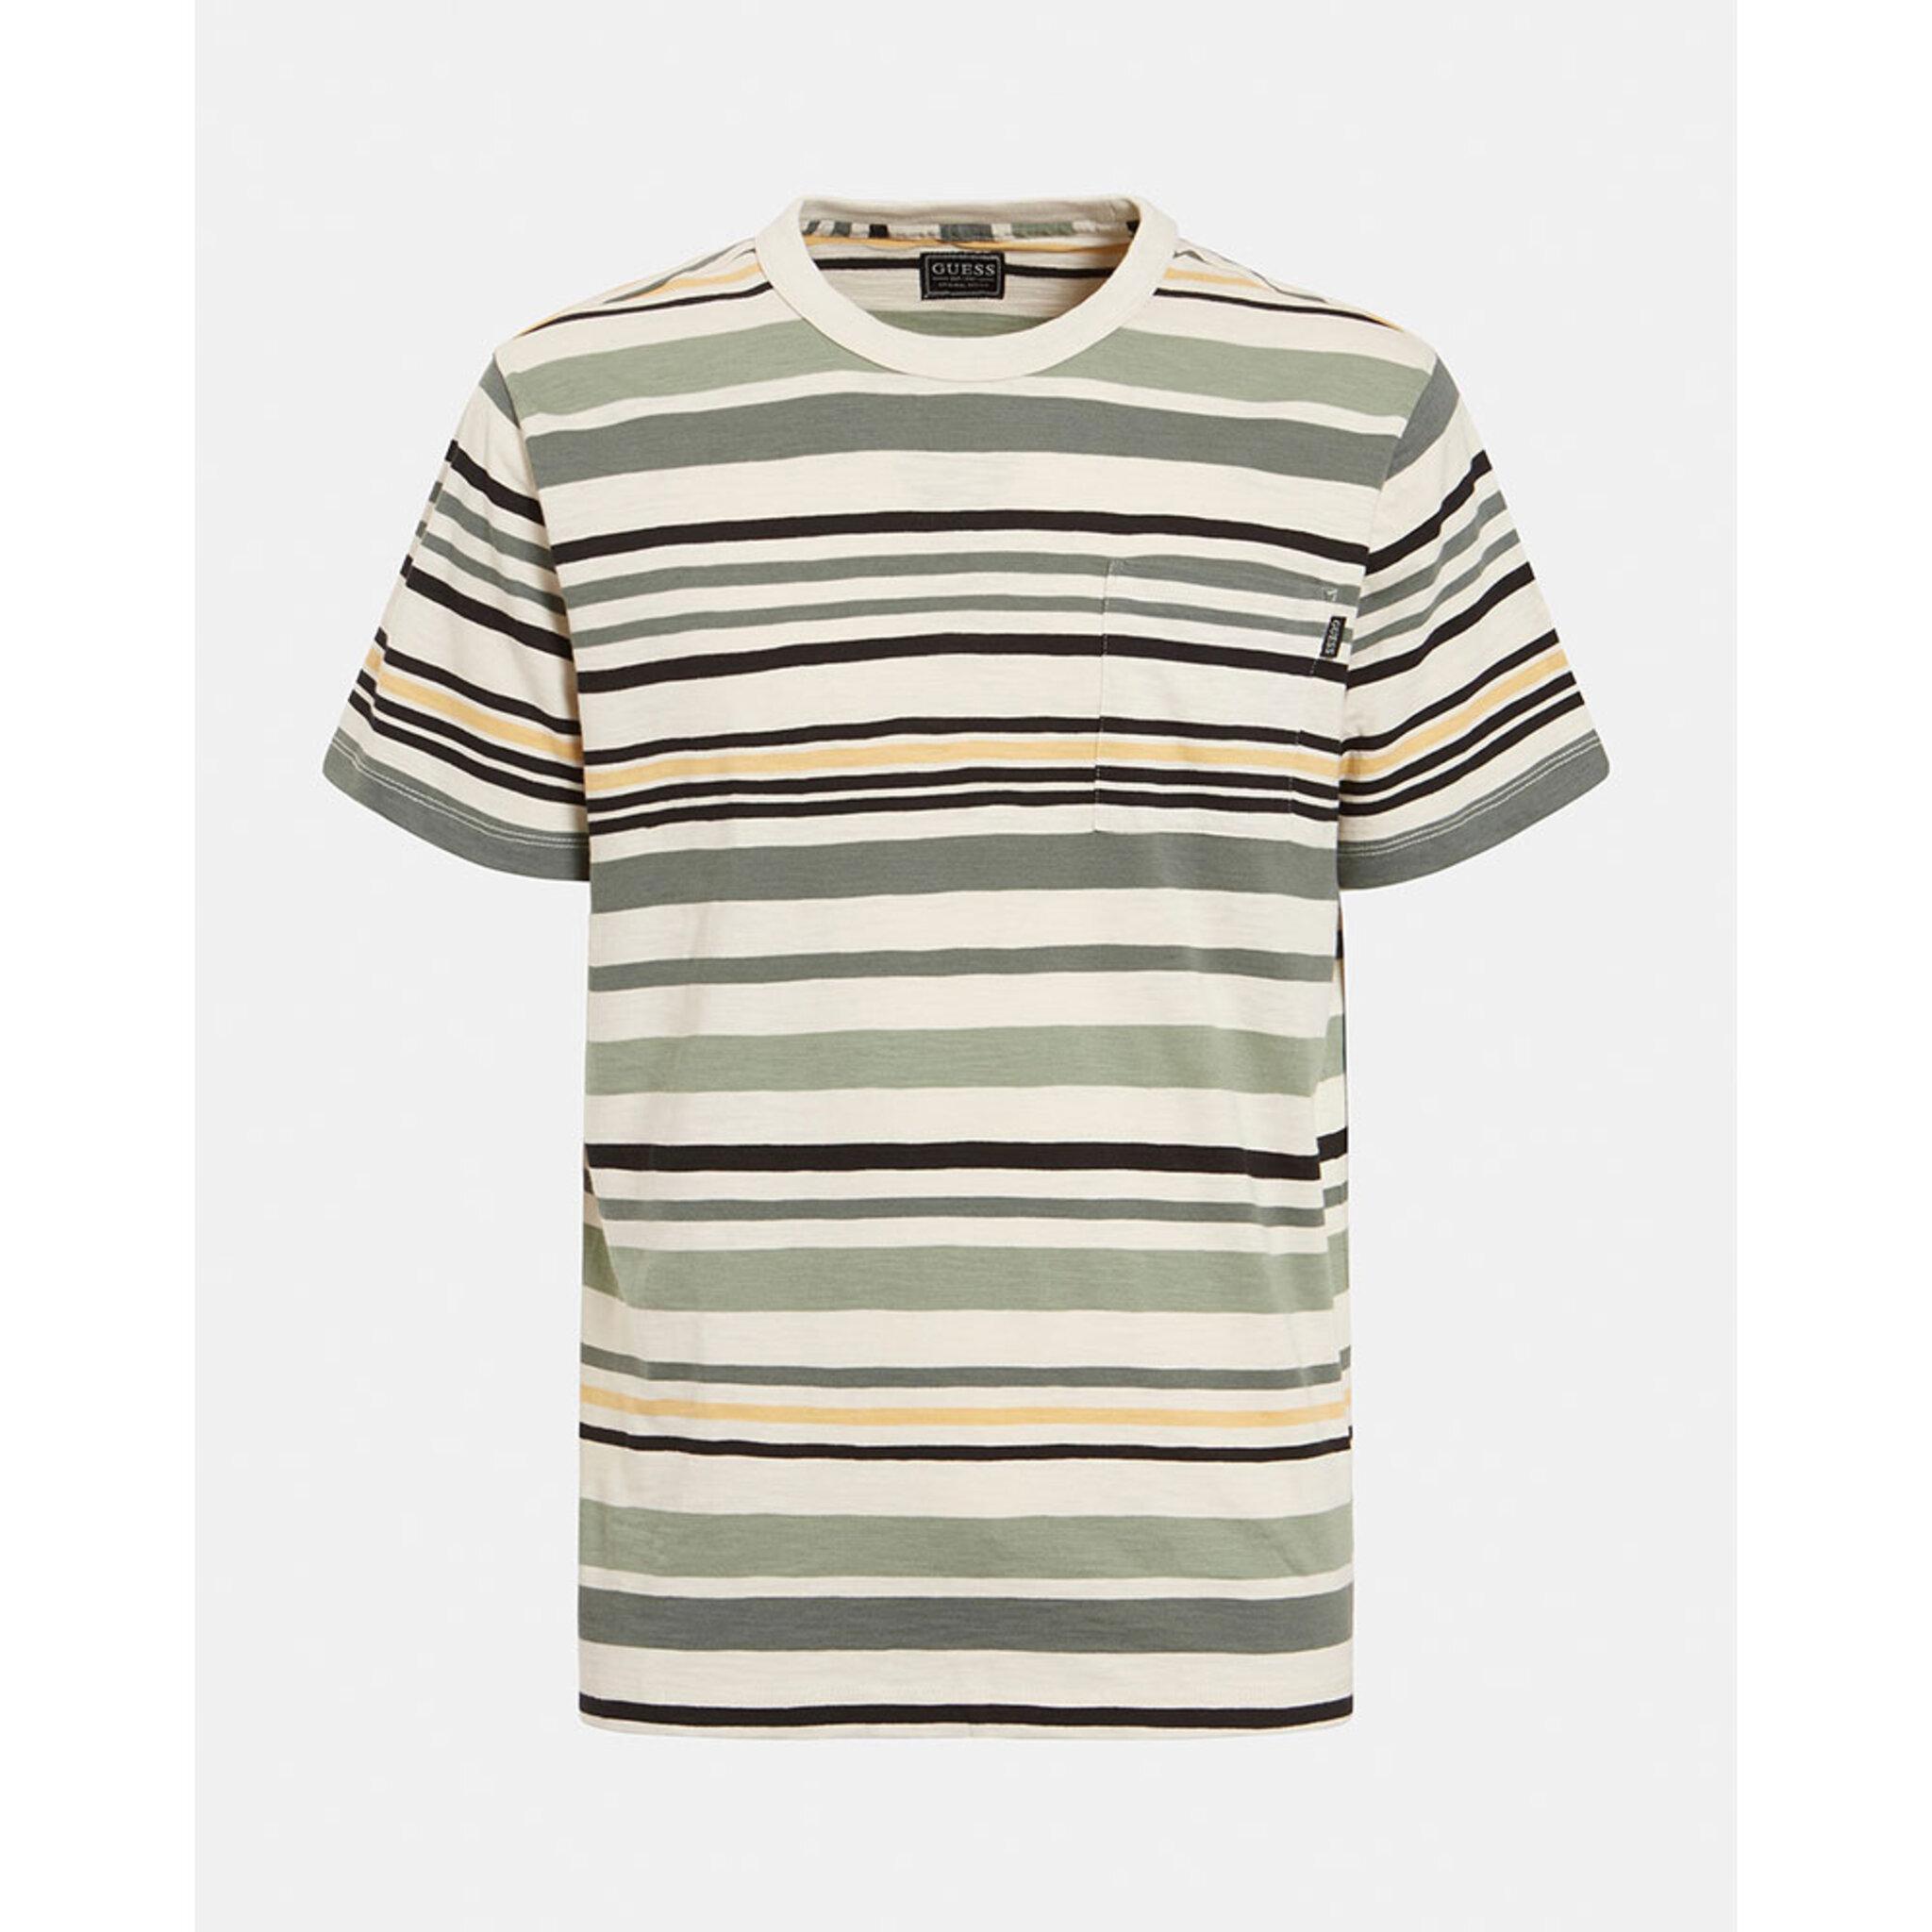 Ss Camp Stripe Pkt Tshirt Short Sleeves